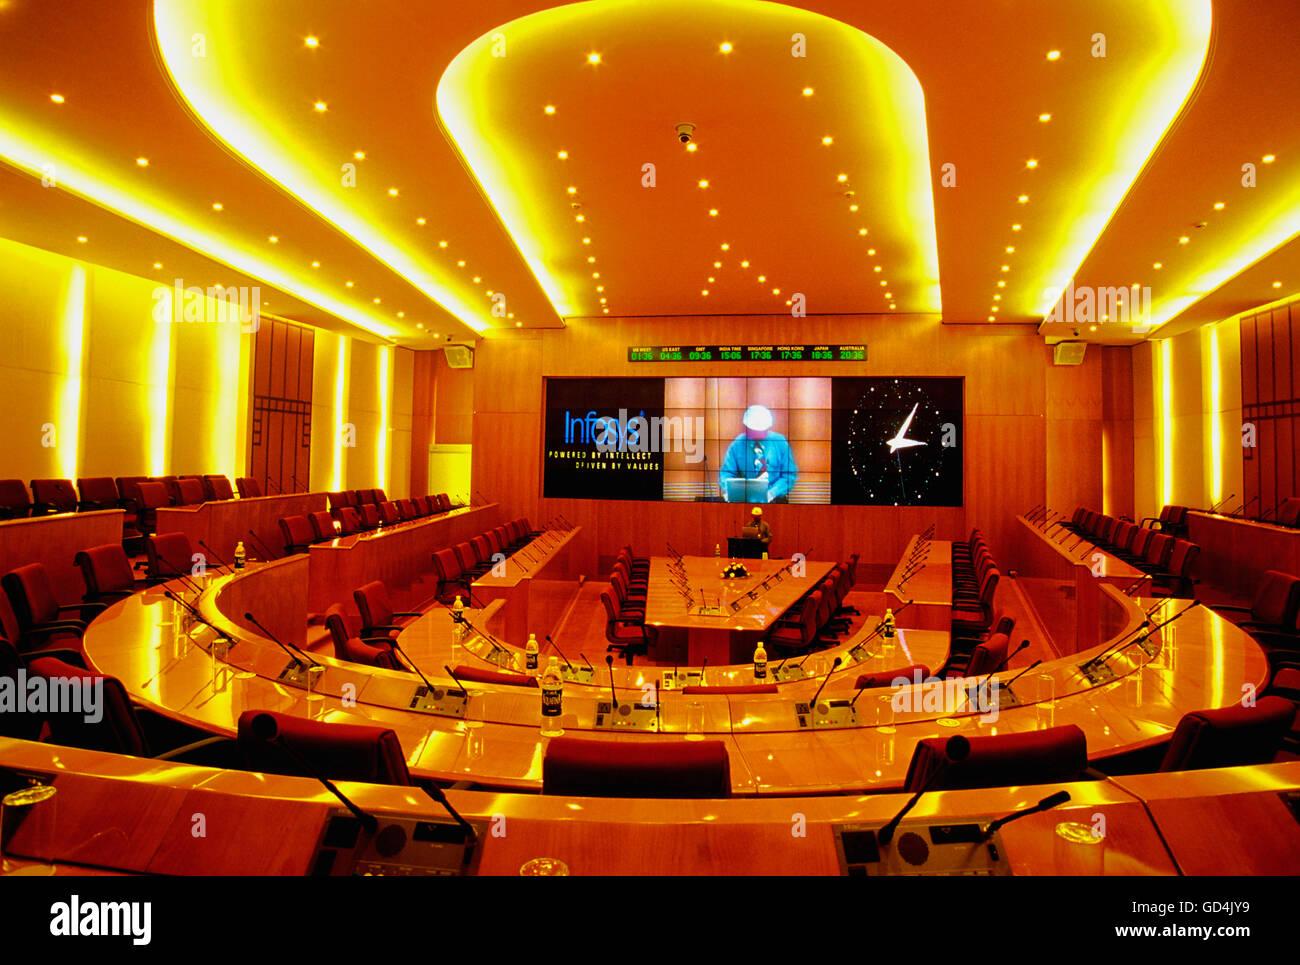 Infosys sala conferenze Immagini Stock